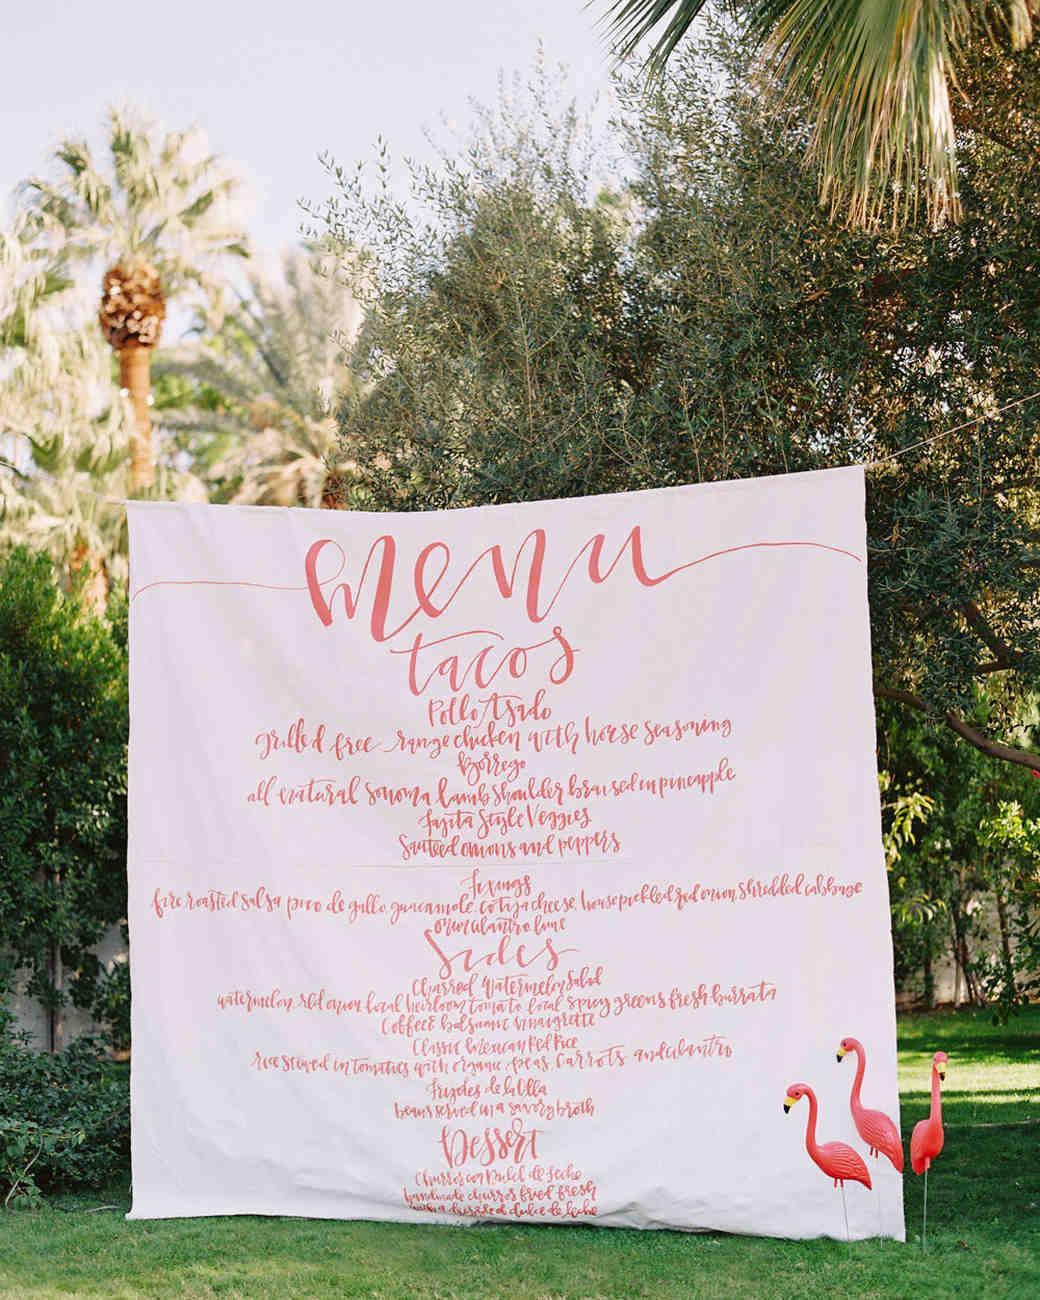 kelly-jeff-wedding-palm-springs-flamingo-menu-pink-5456-s112234.jpg